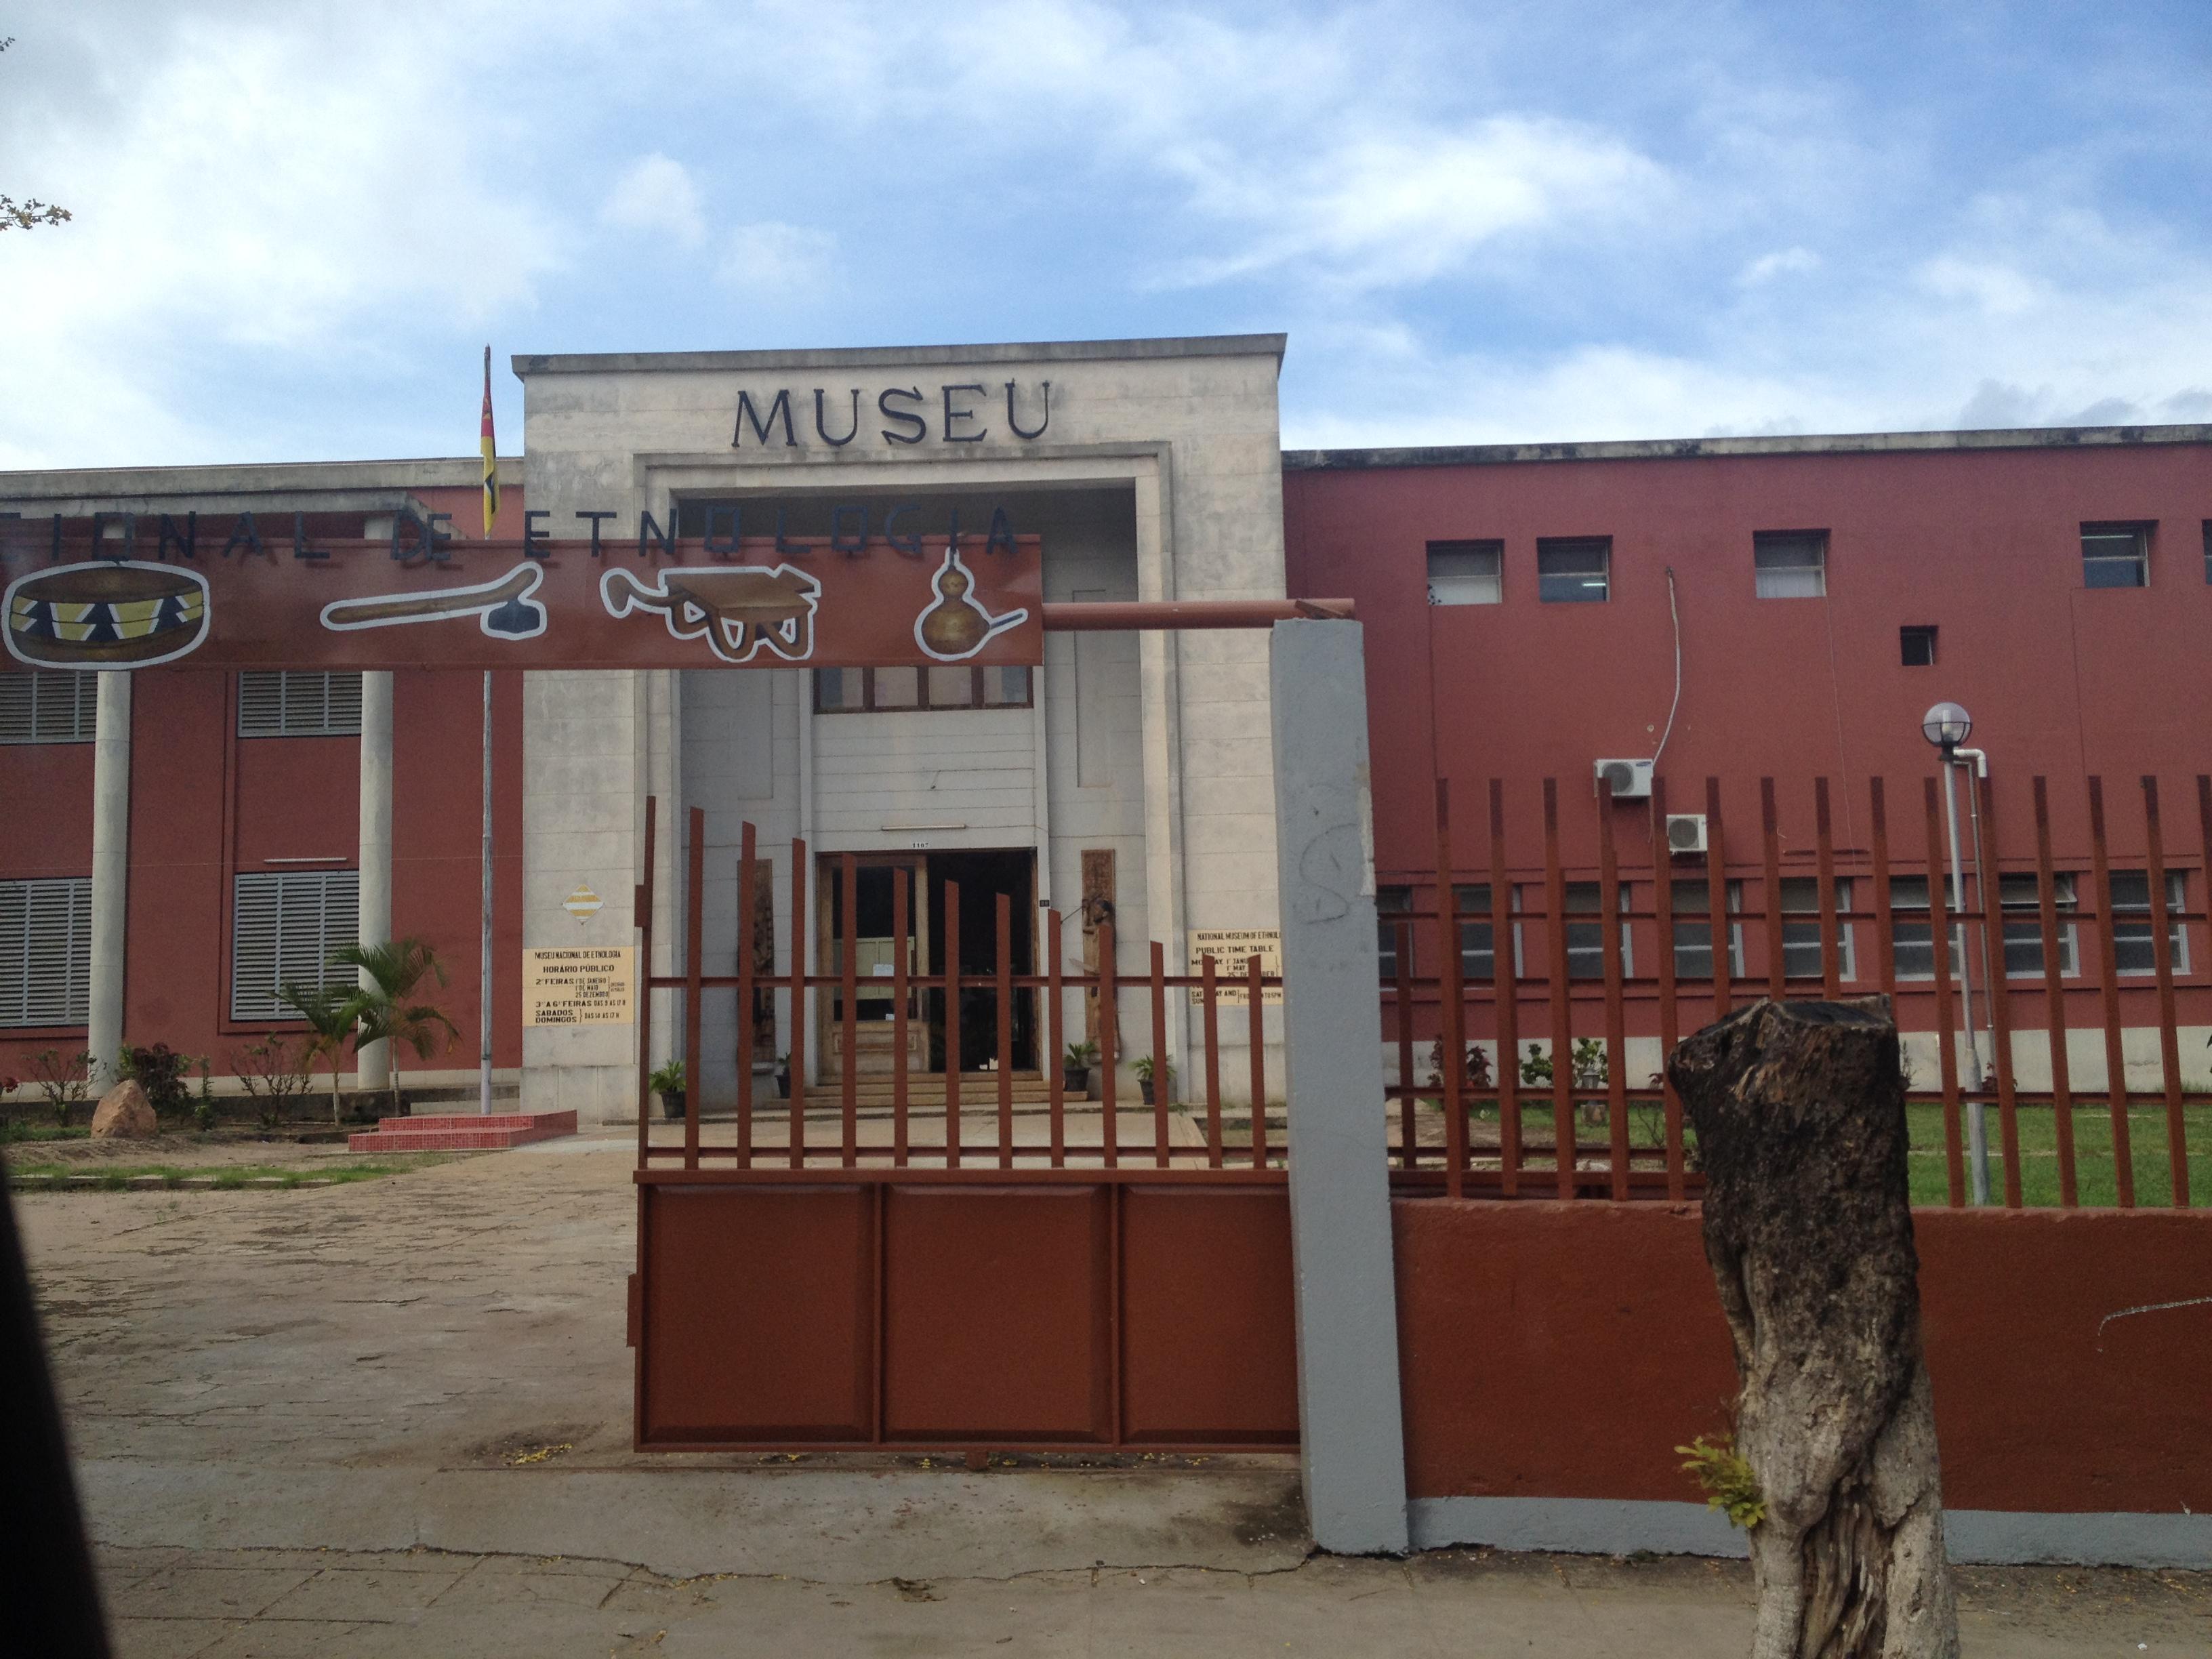 Museu Nacional de Etnografia de Nampula